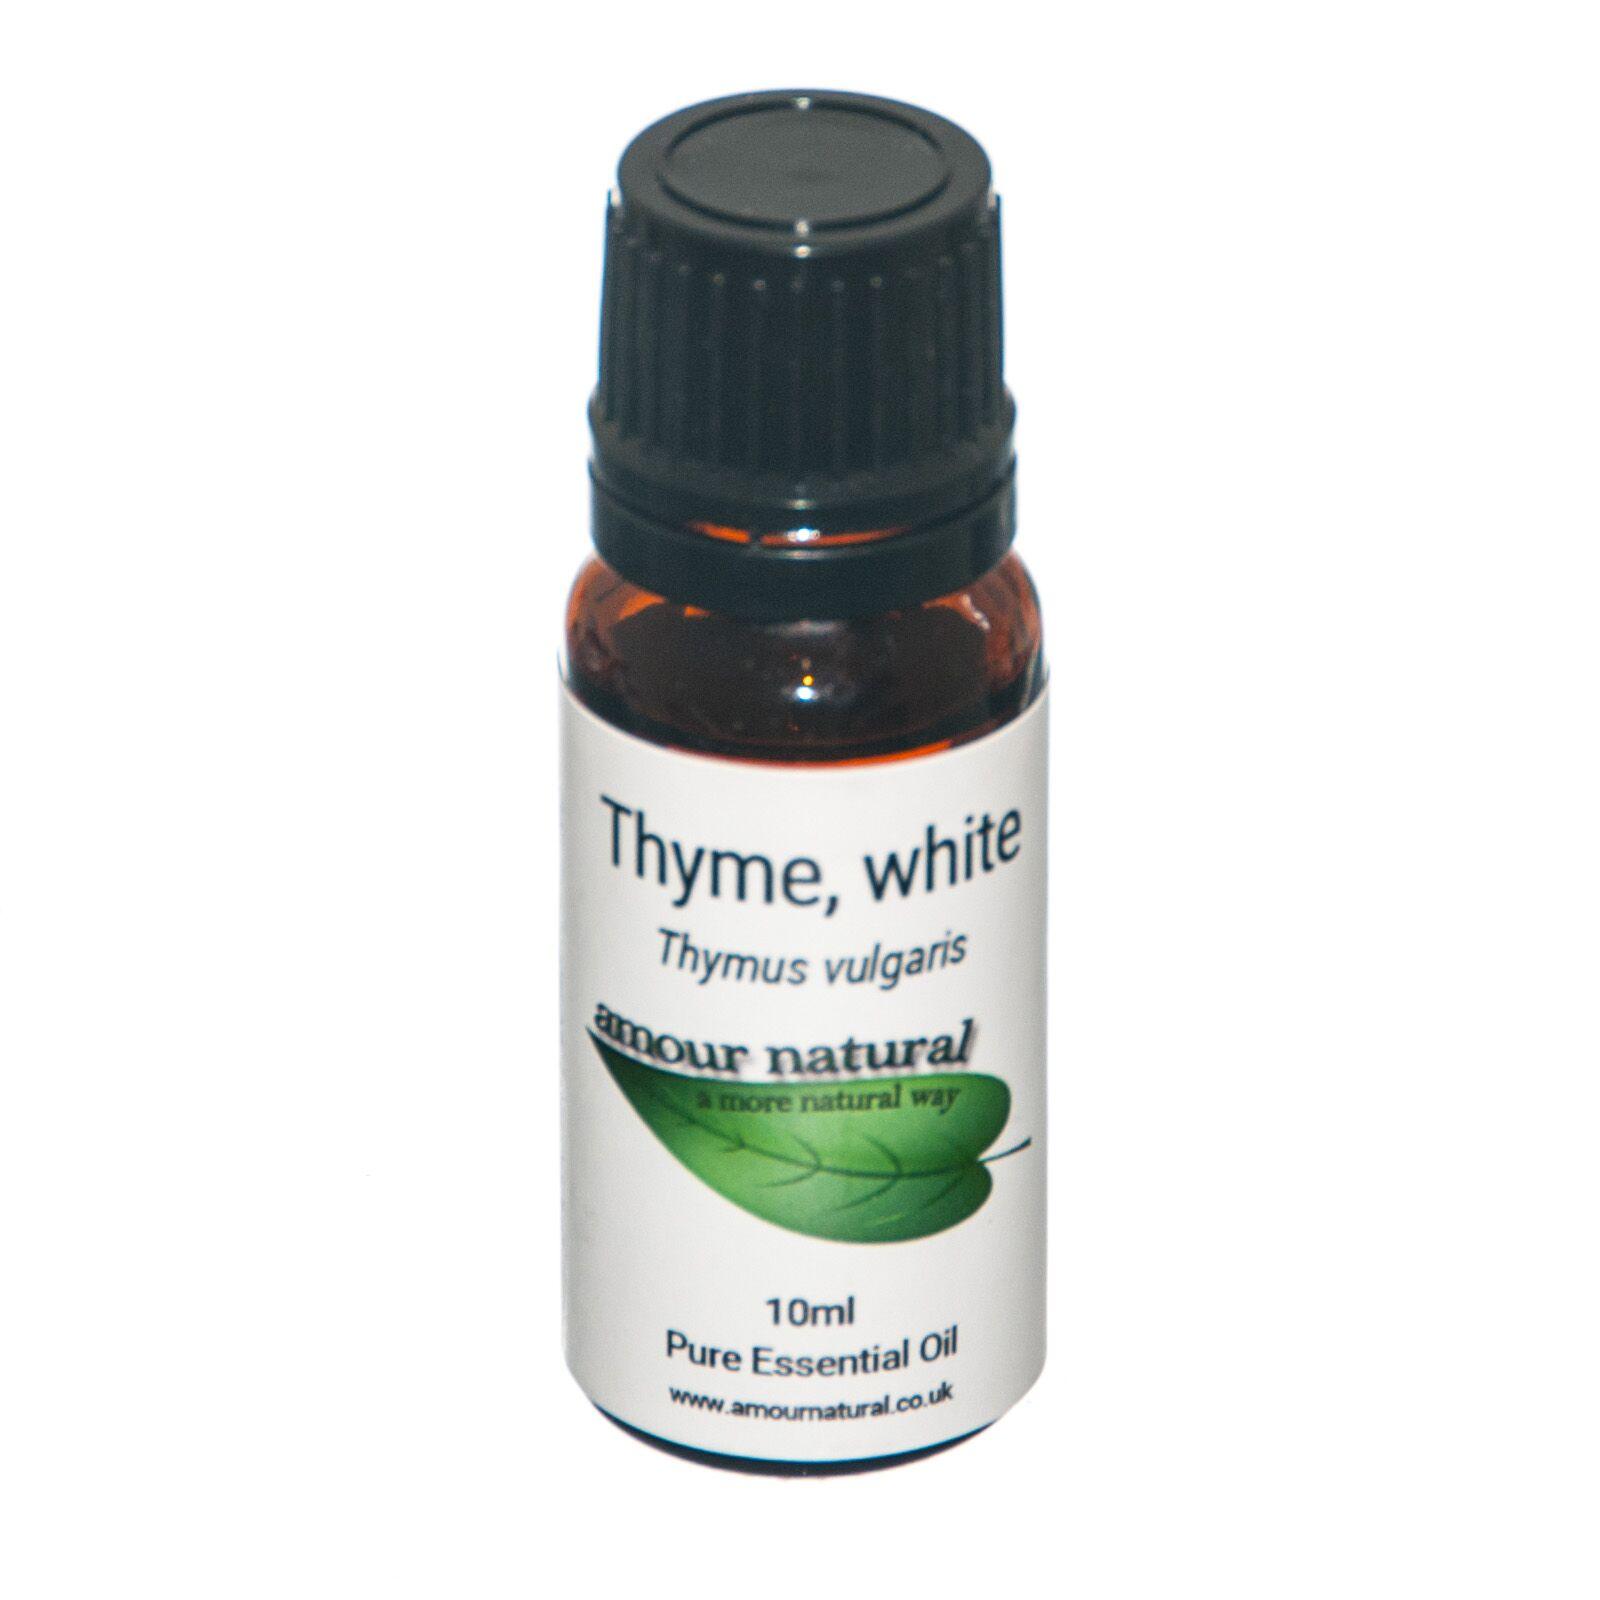 Thyme (White) Pure Essential Oil 10ml